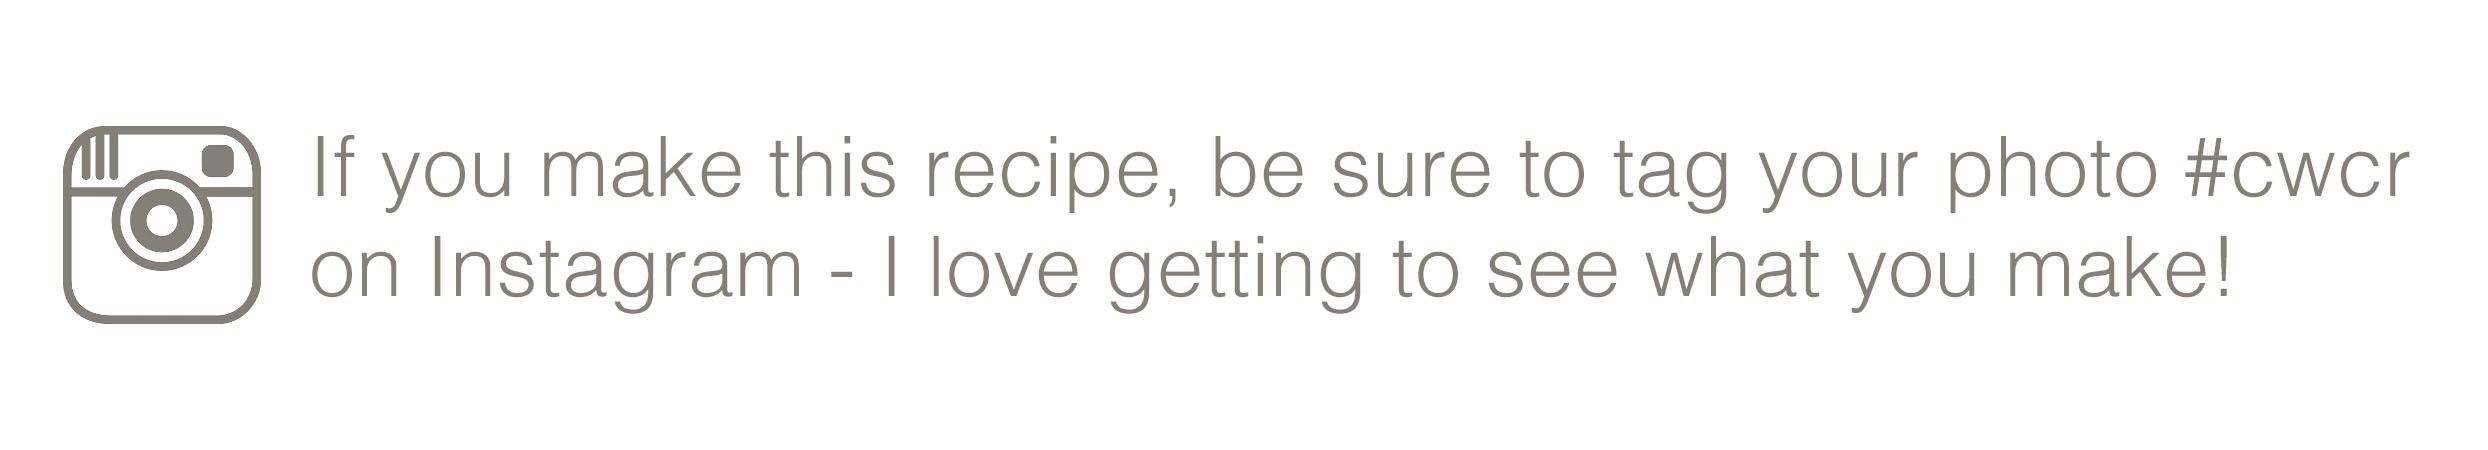 insta hashtag for recipes.jpg